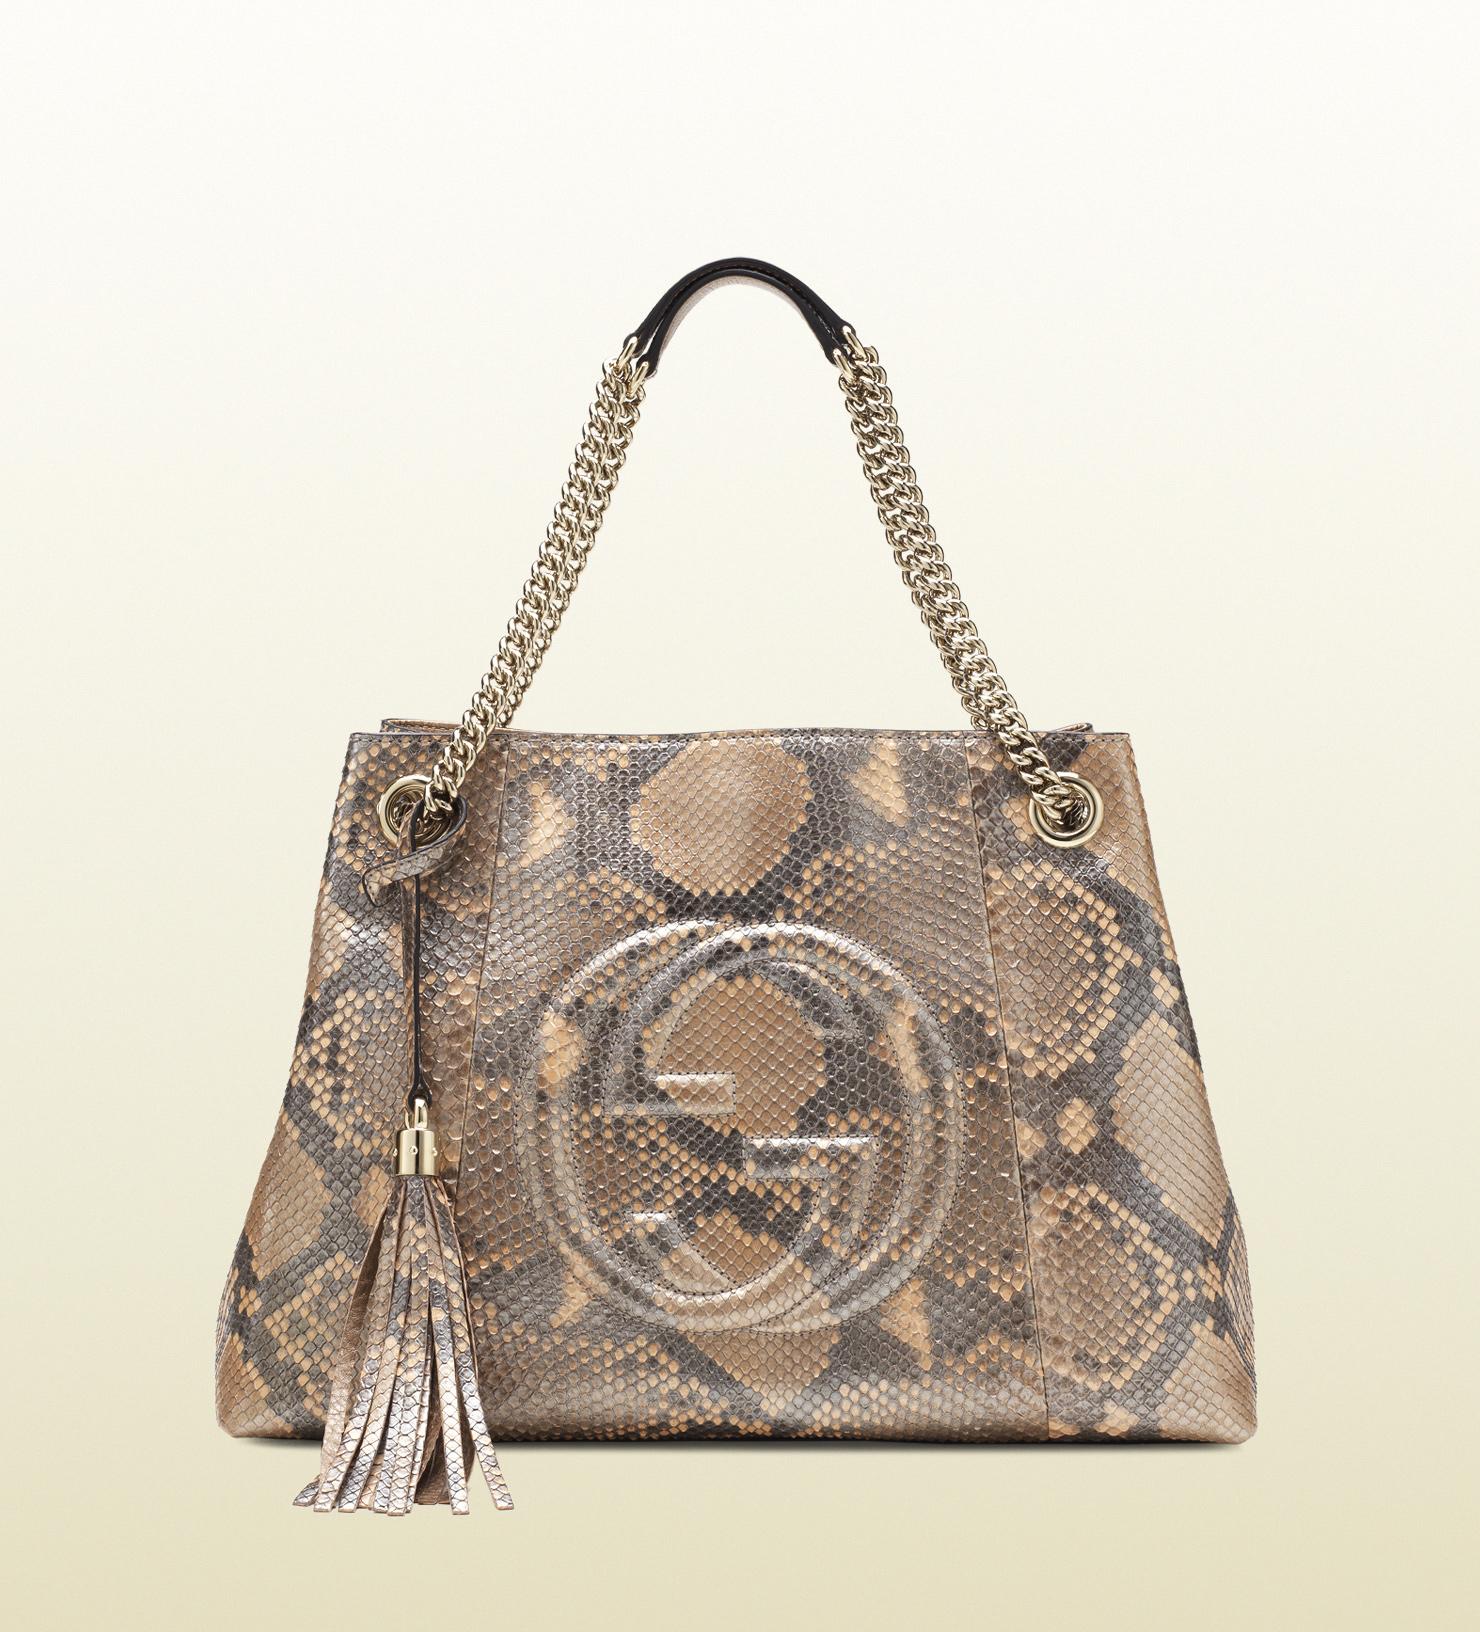 32a1f443784e Gucci Python Handbag - Foto Handbag All Collections Salonagafiya.Com